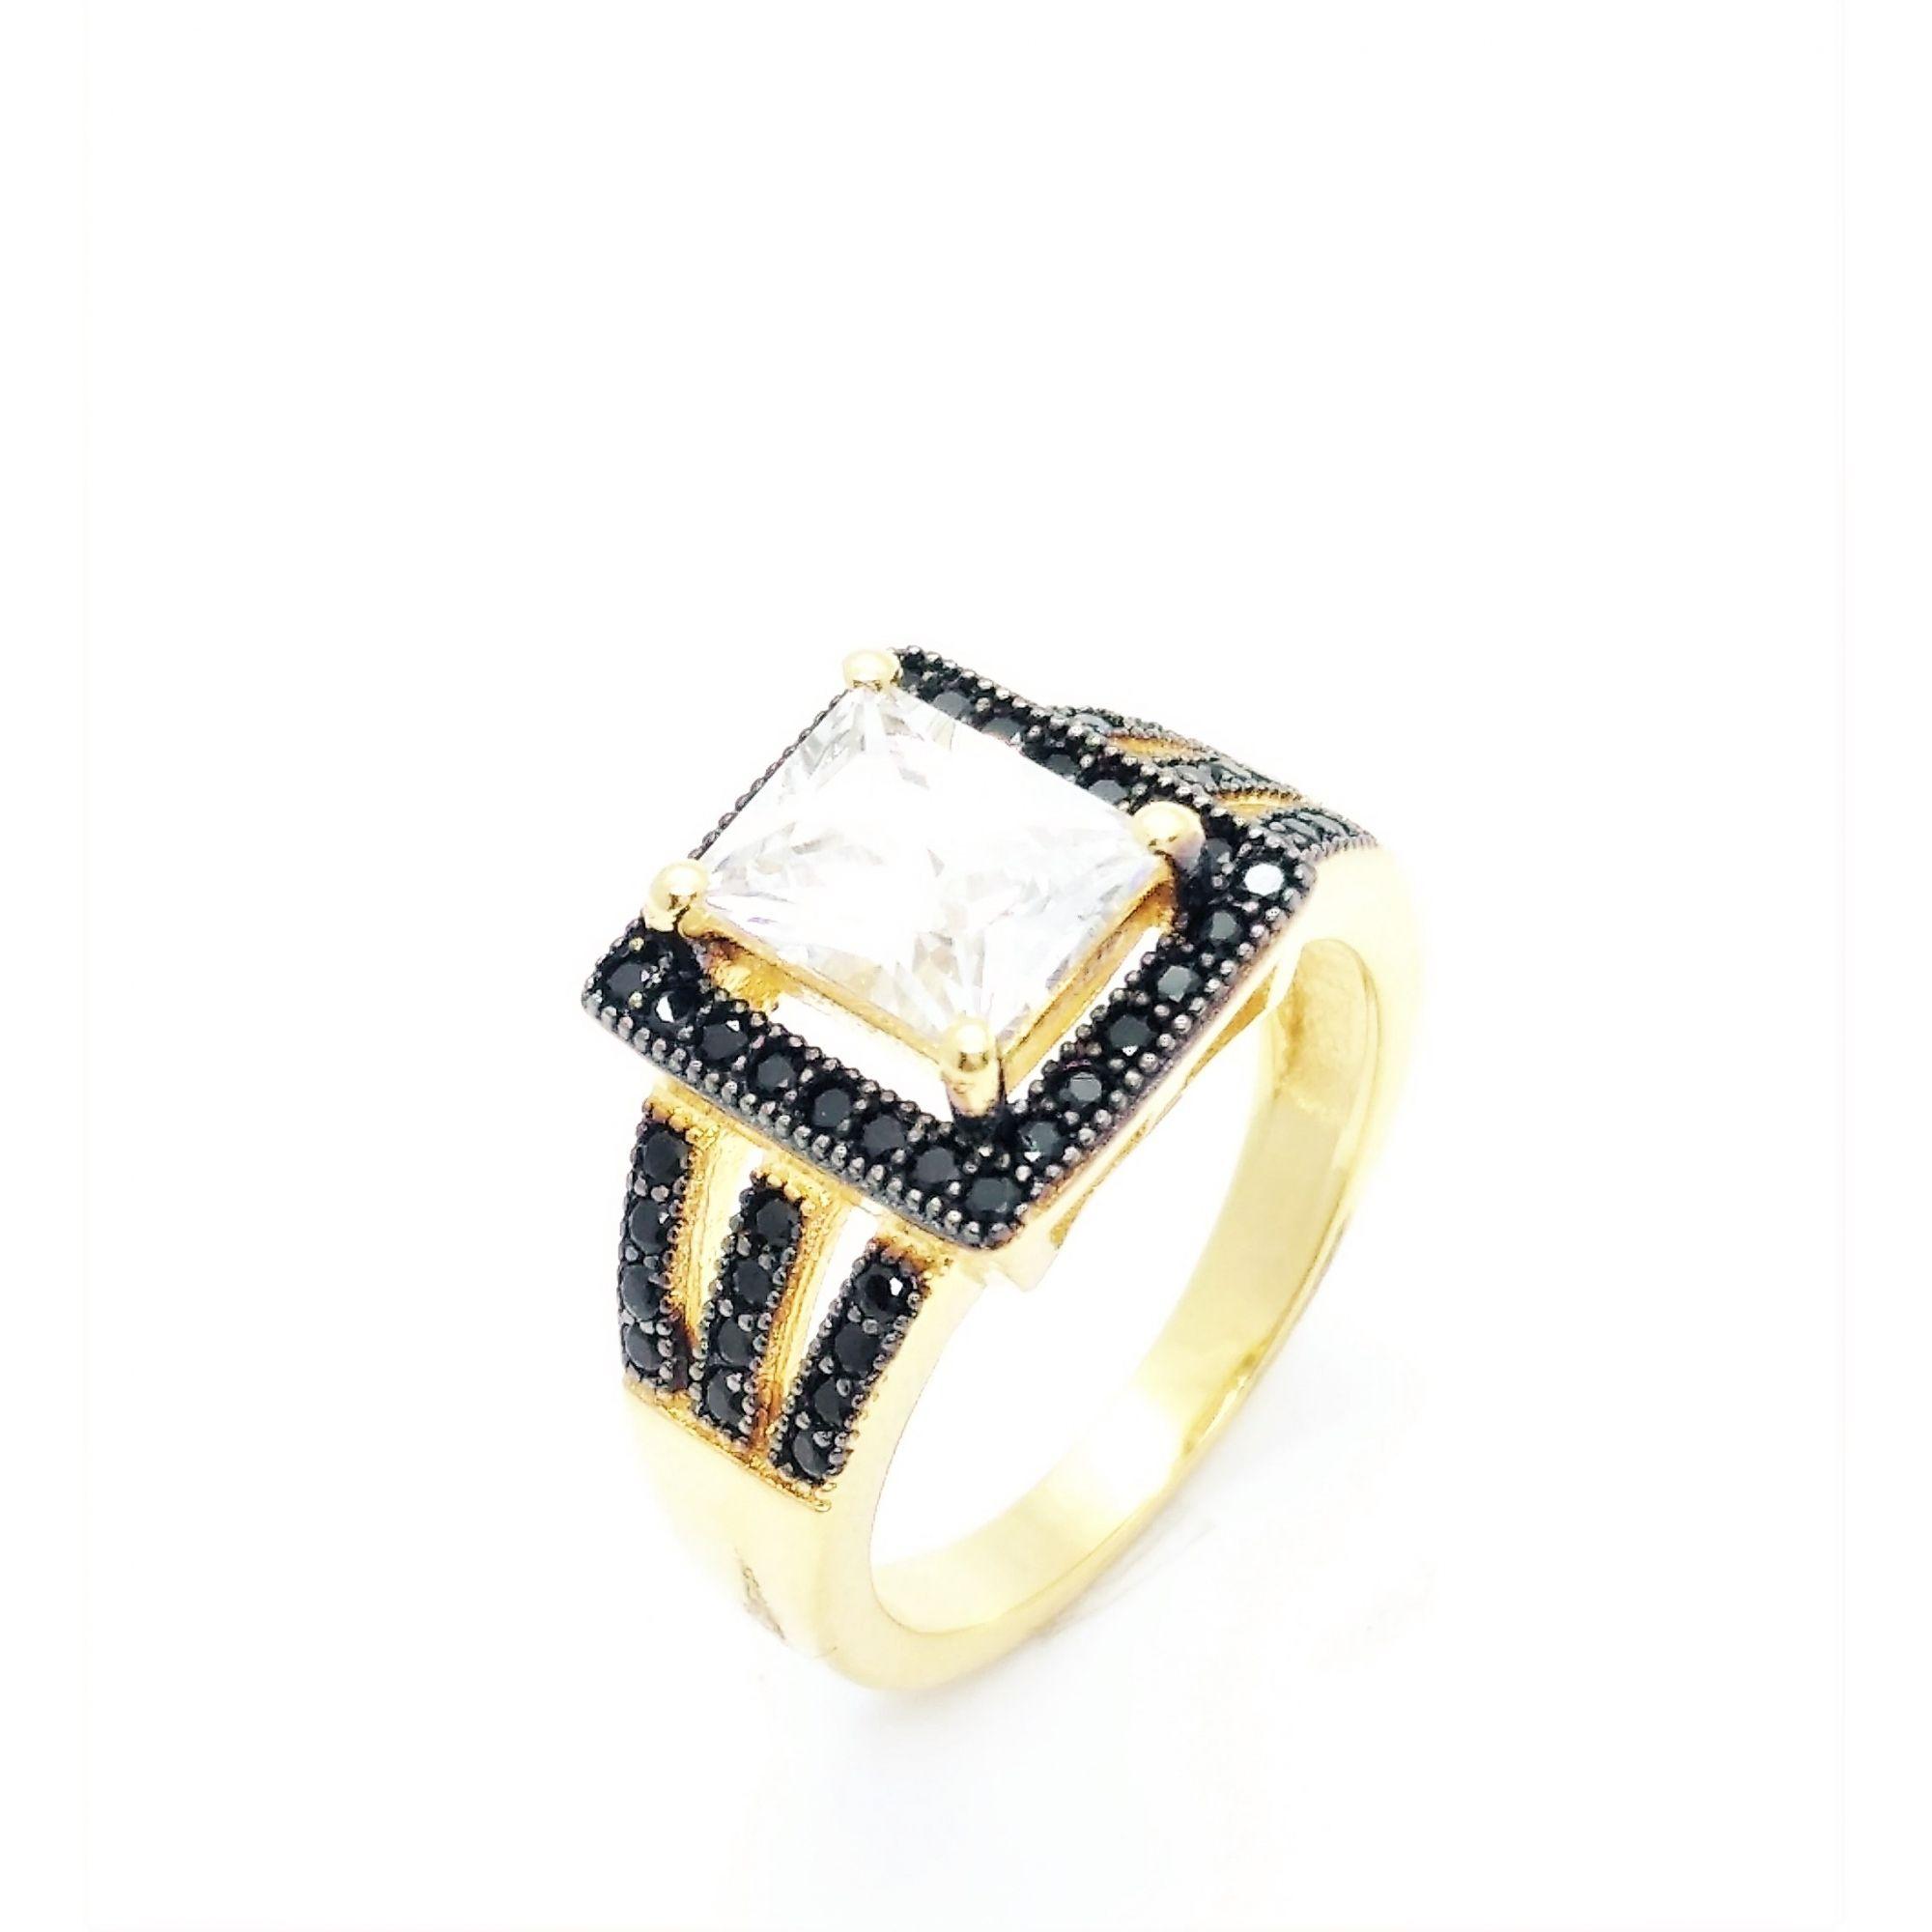 Anel Zirconia Cristal E Microzirconias Negras Banho Ouro 18k 2641